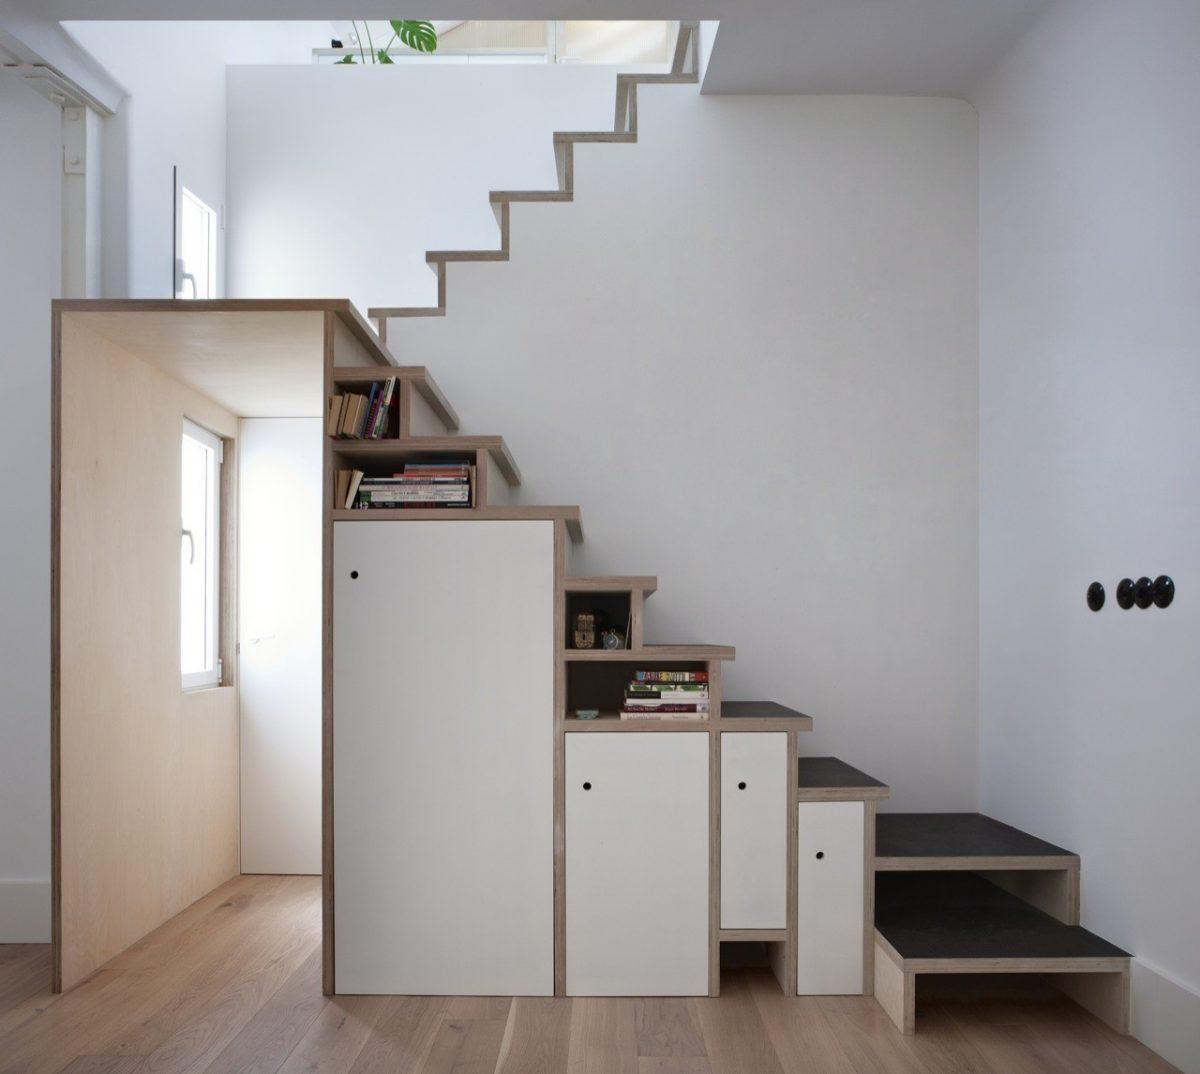 Soluzioni salvaspazio casa - Idee salvaspazio casa ...